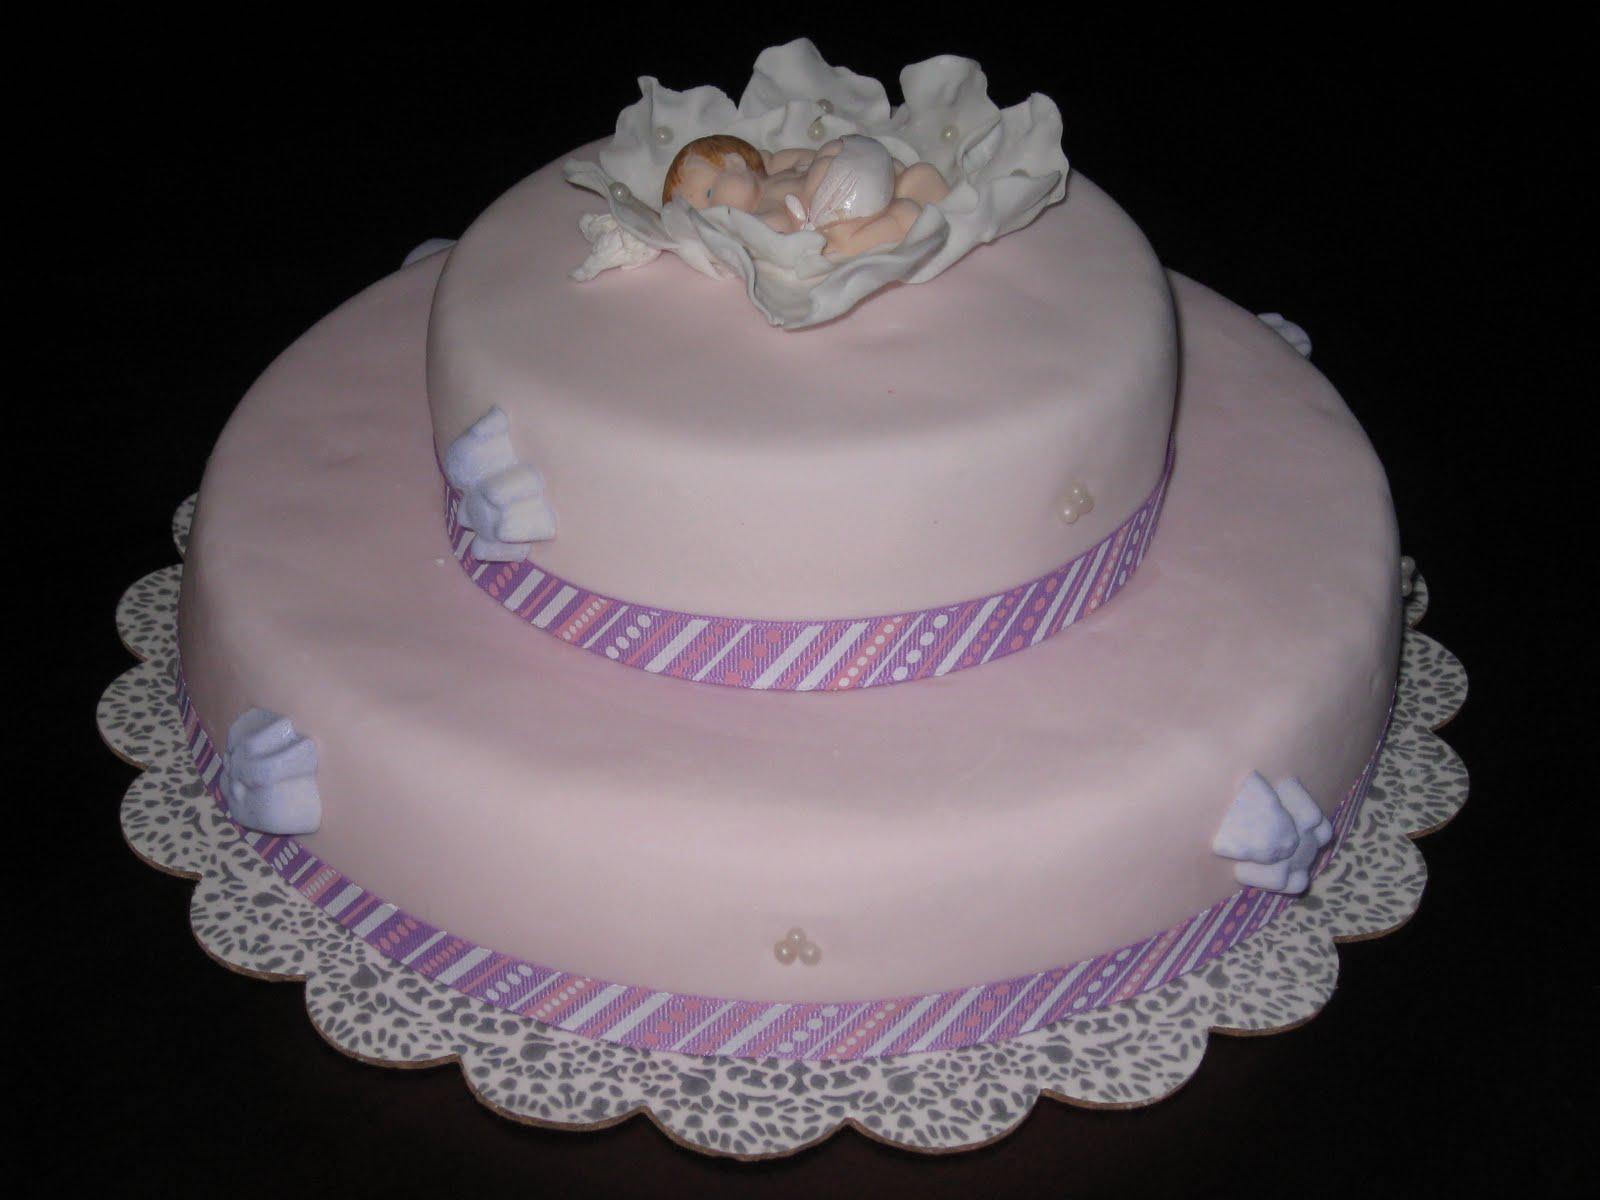 Tortas Algo Torta Para Bautizo Pic Portal Picture